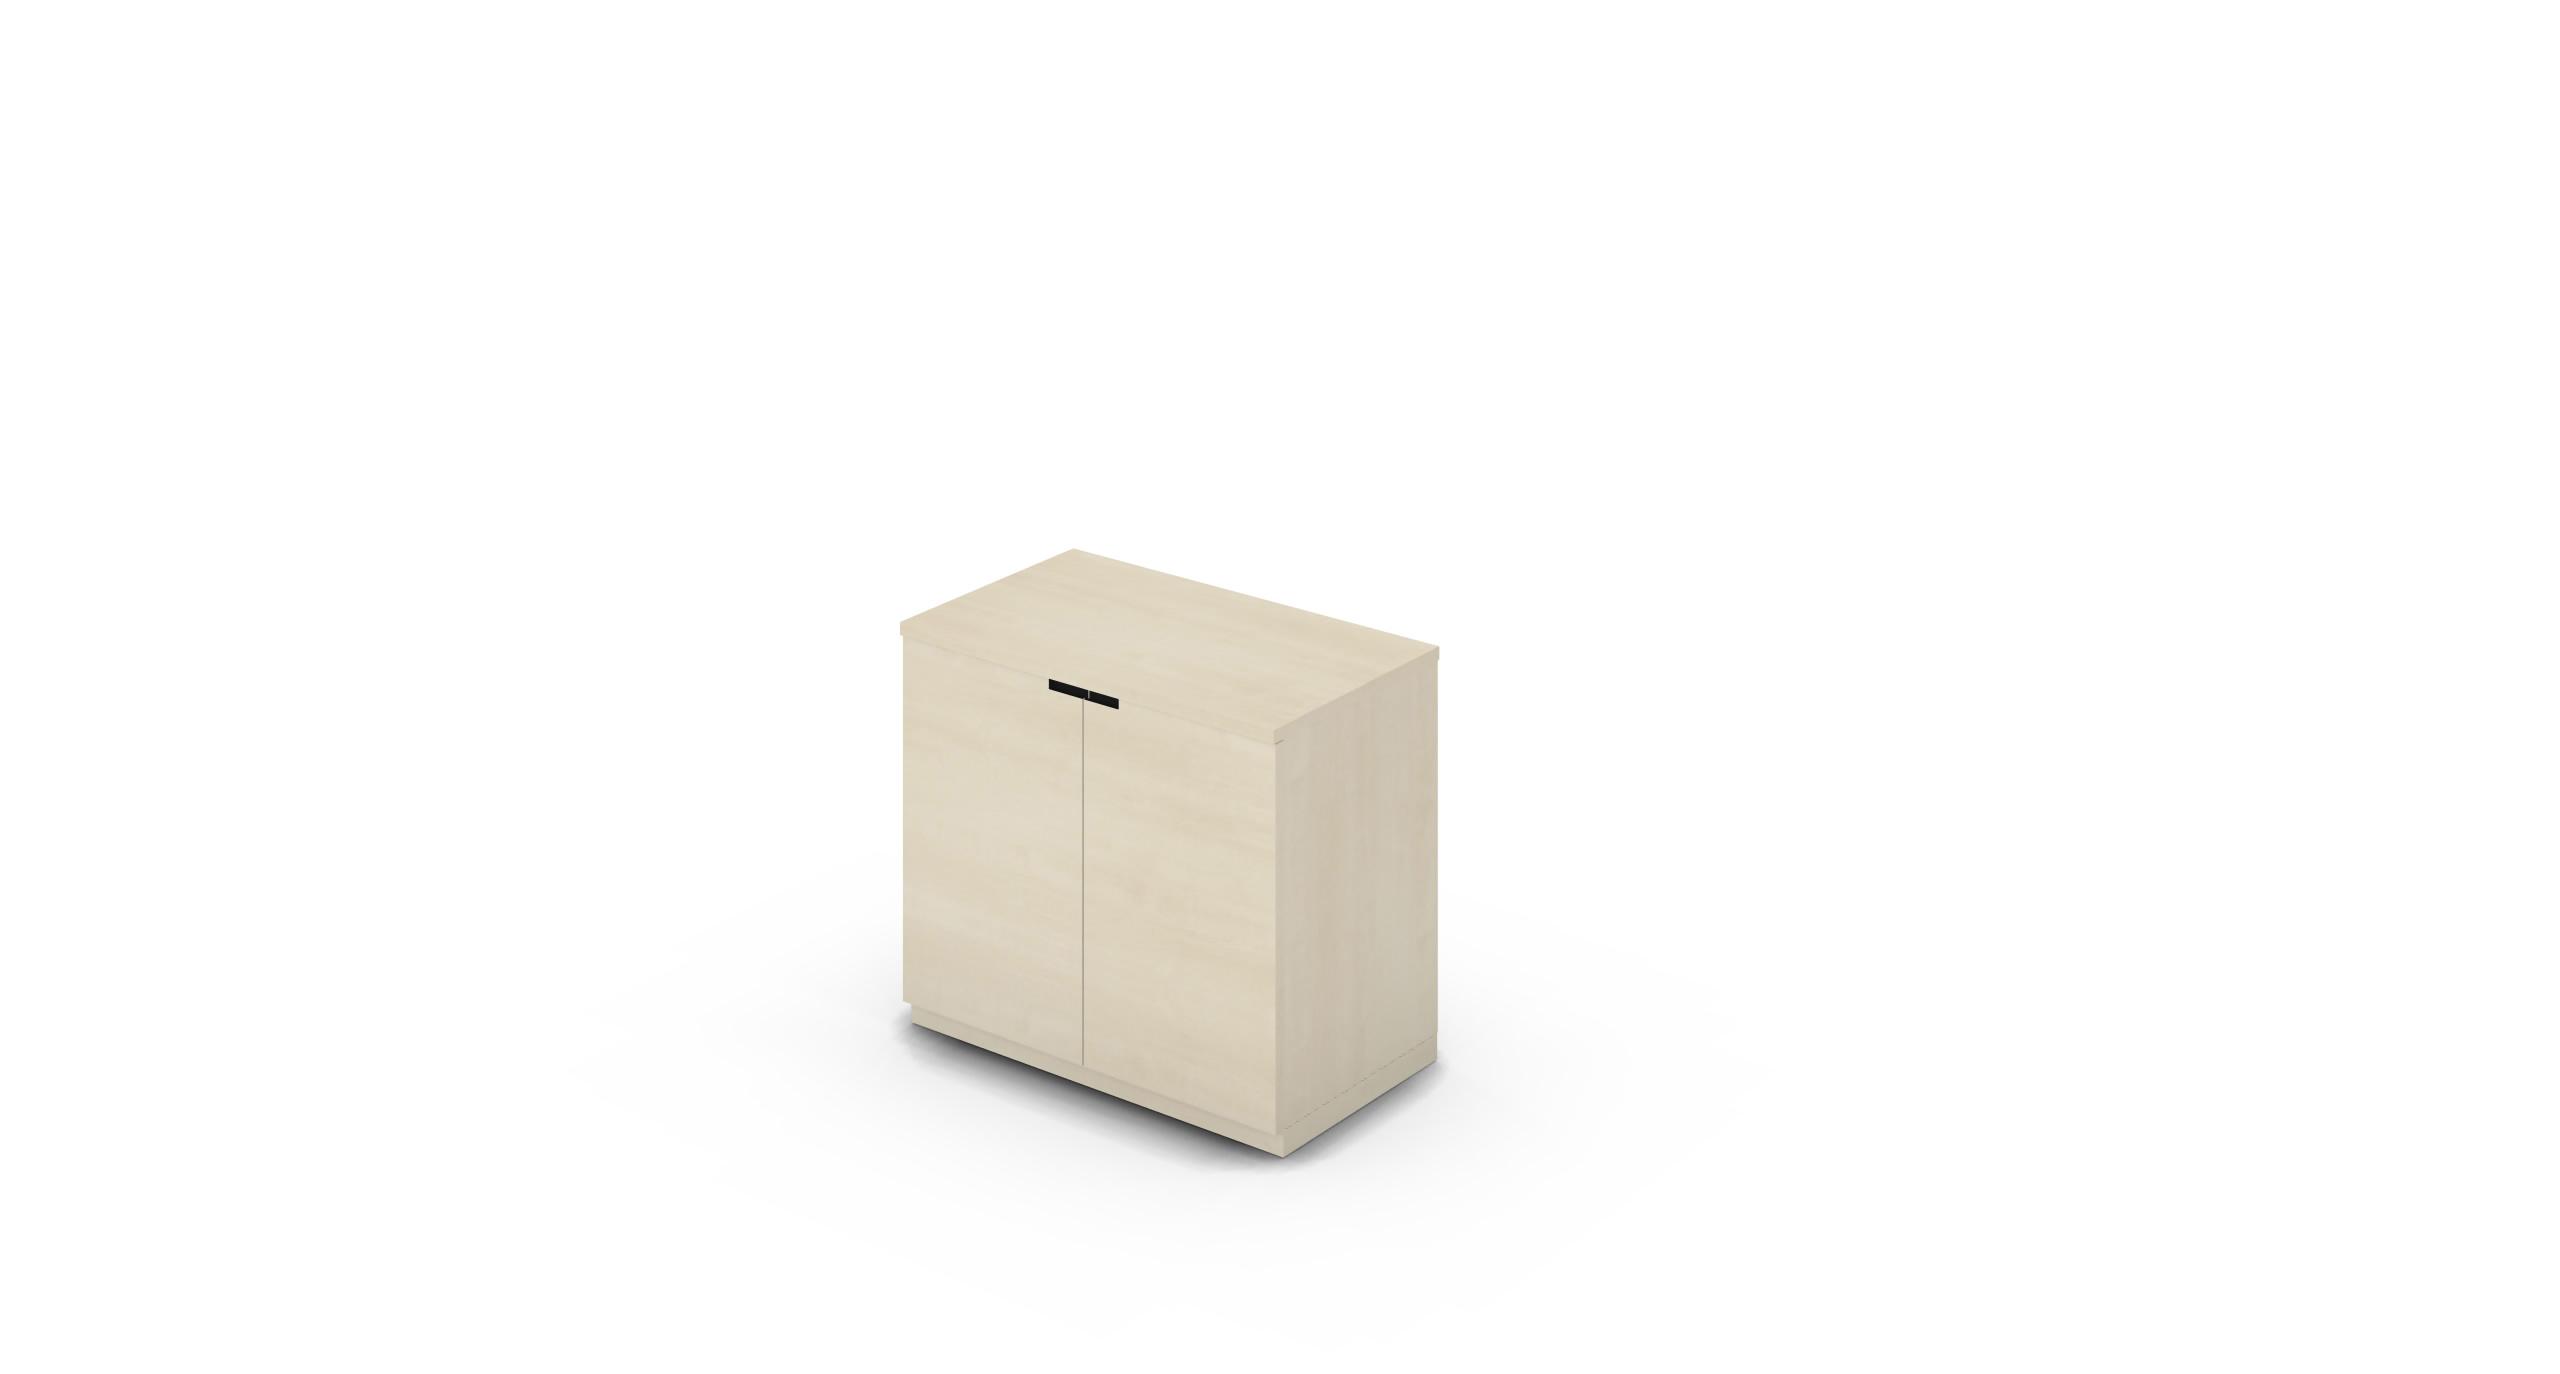 Cabinet_800x450x775_HD_Maple_CutOut_NoCylinder